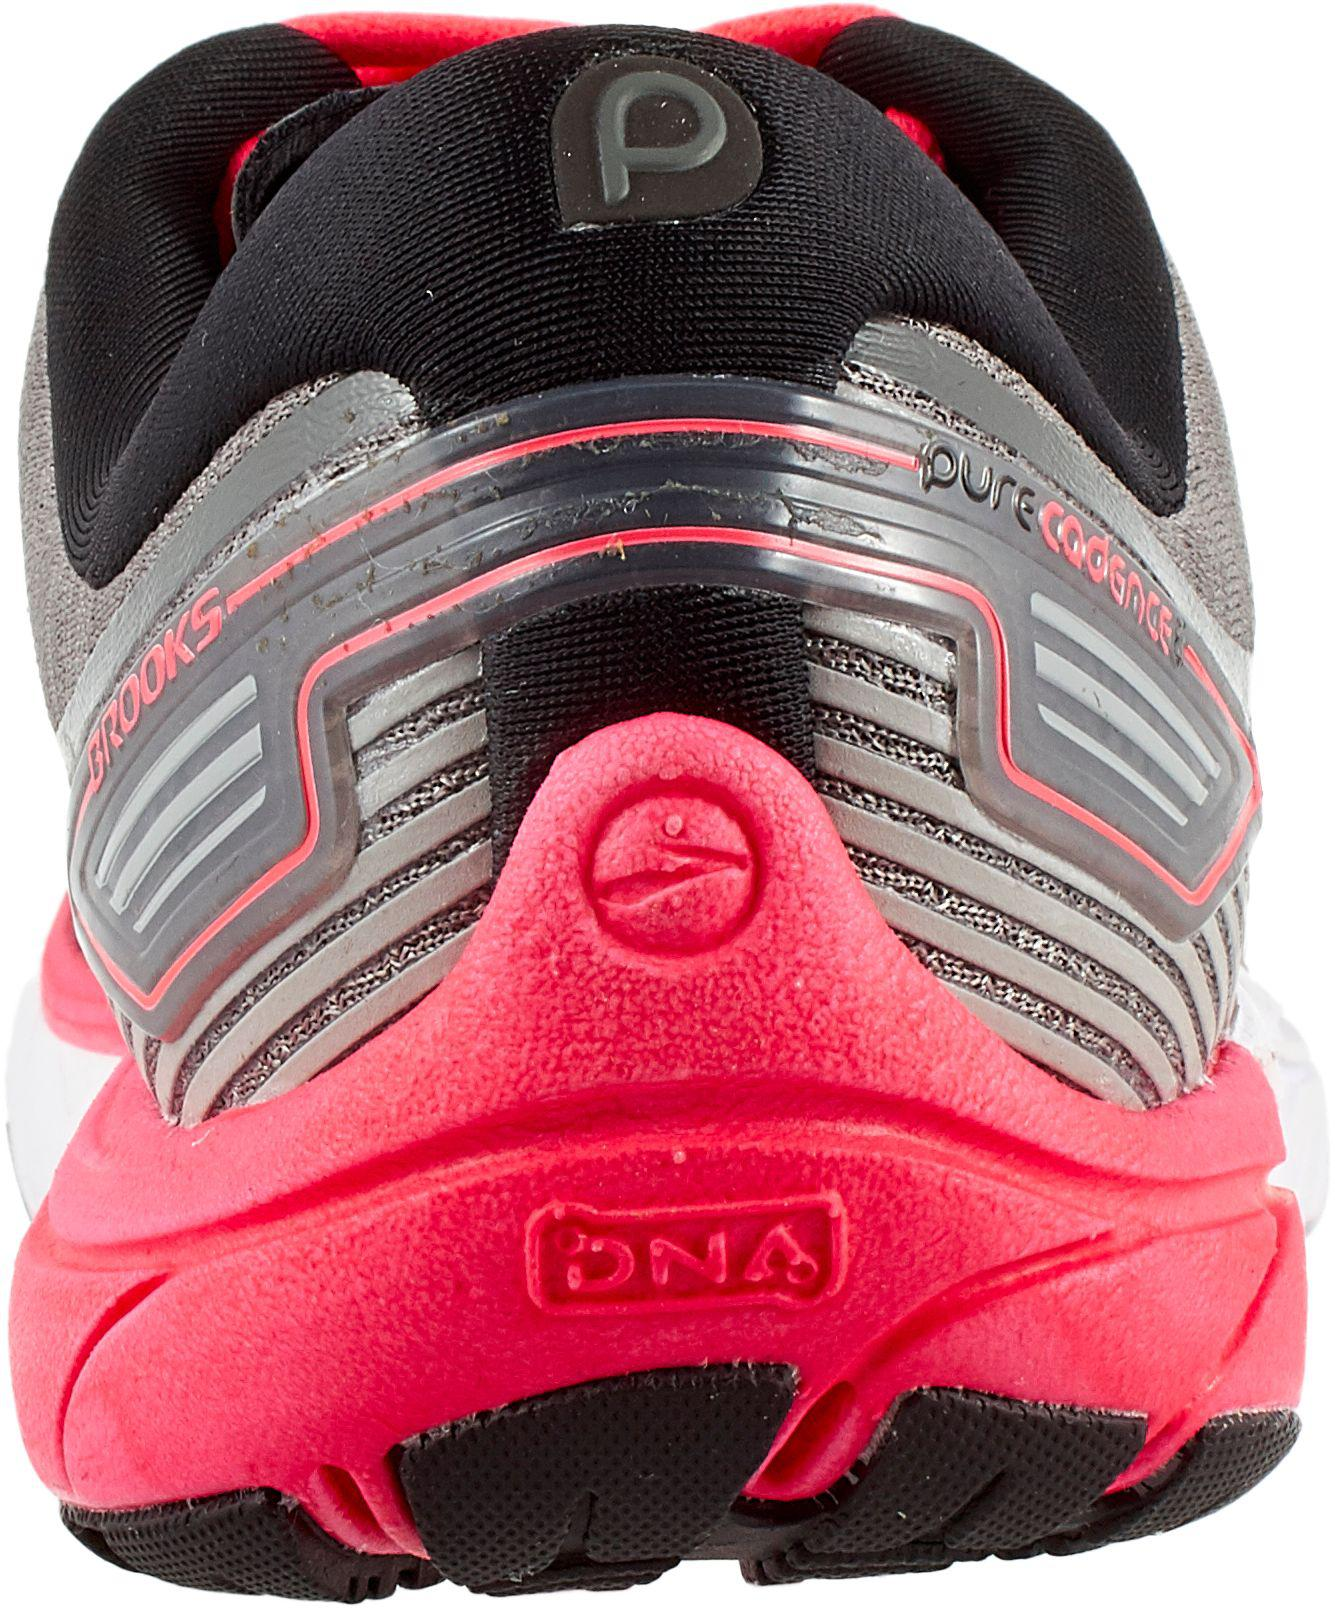 f585e4b8501 Brooks - Multicolor Purecadence 6 Running Shoes - Lyst